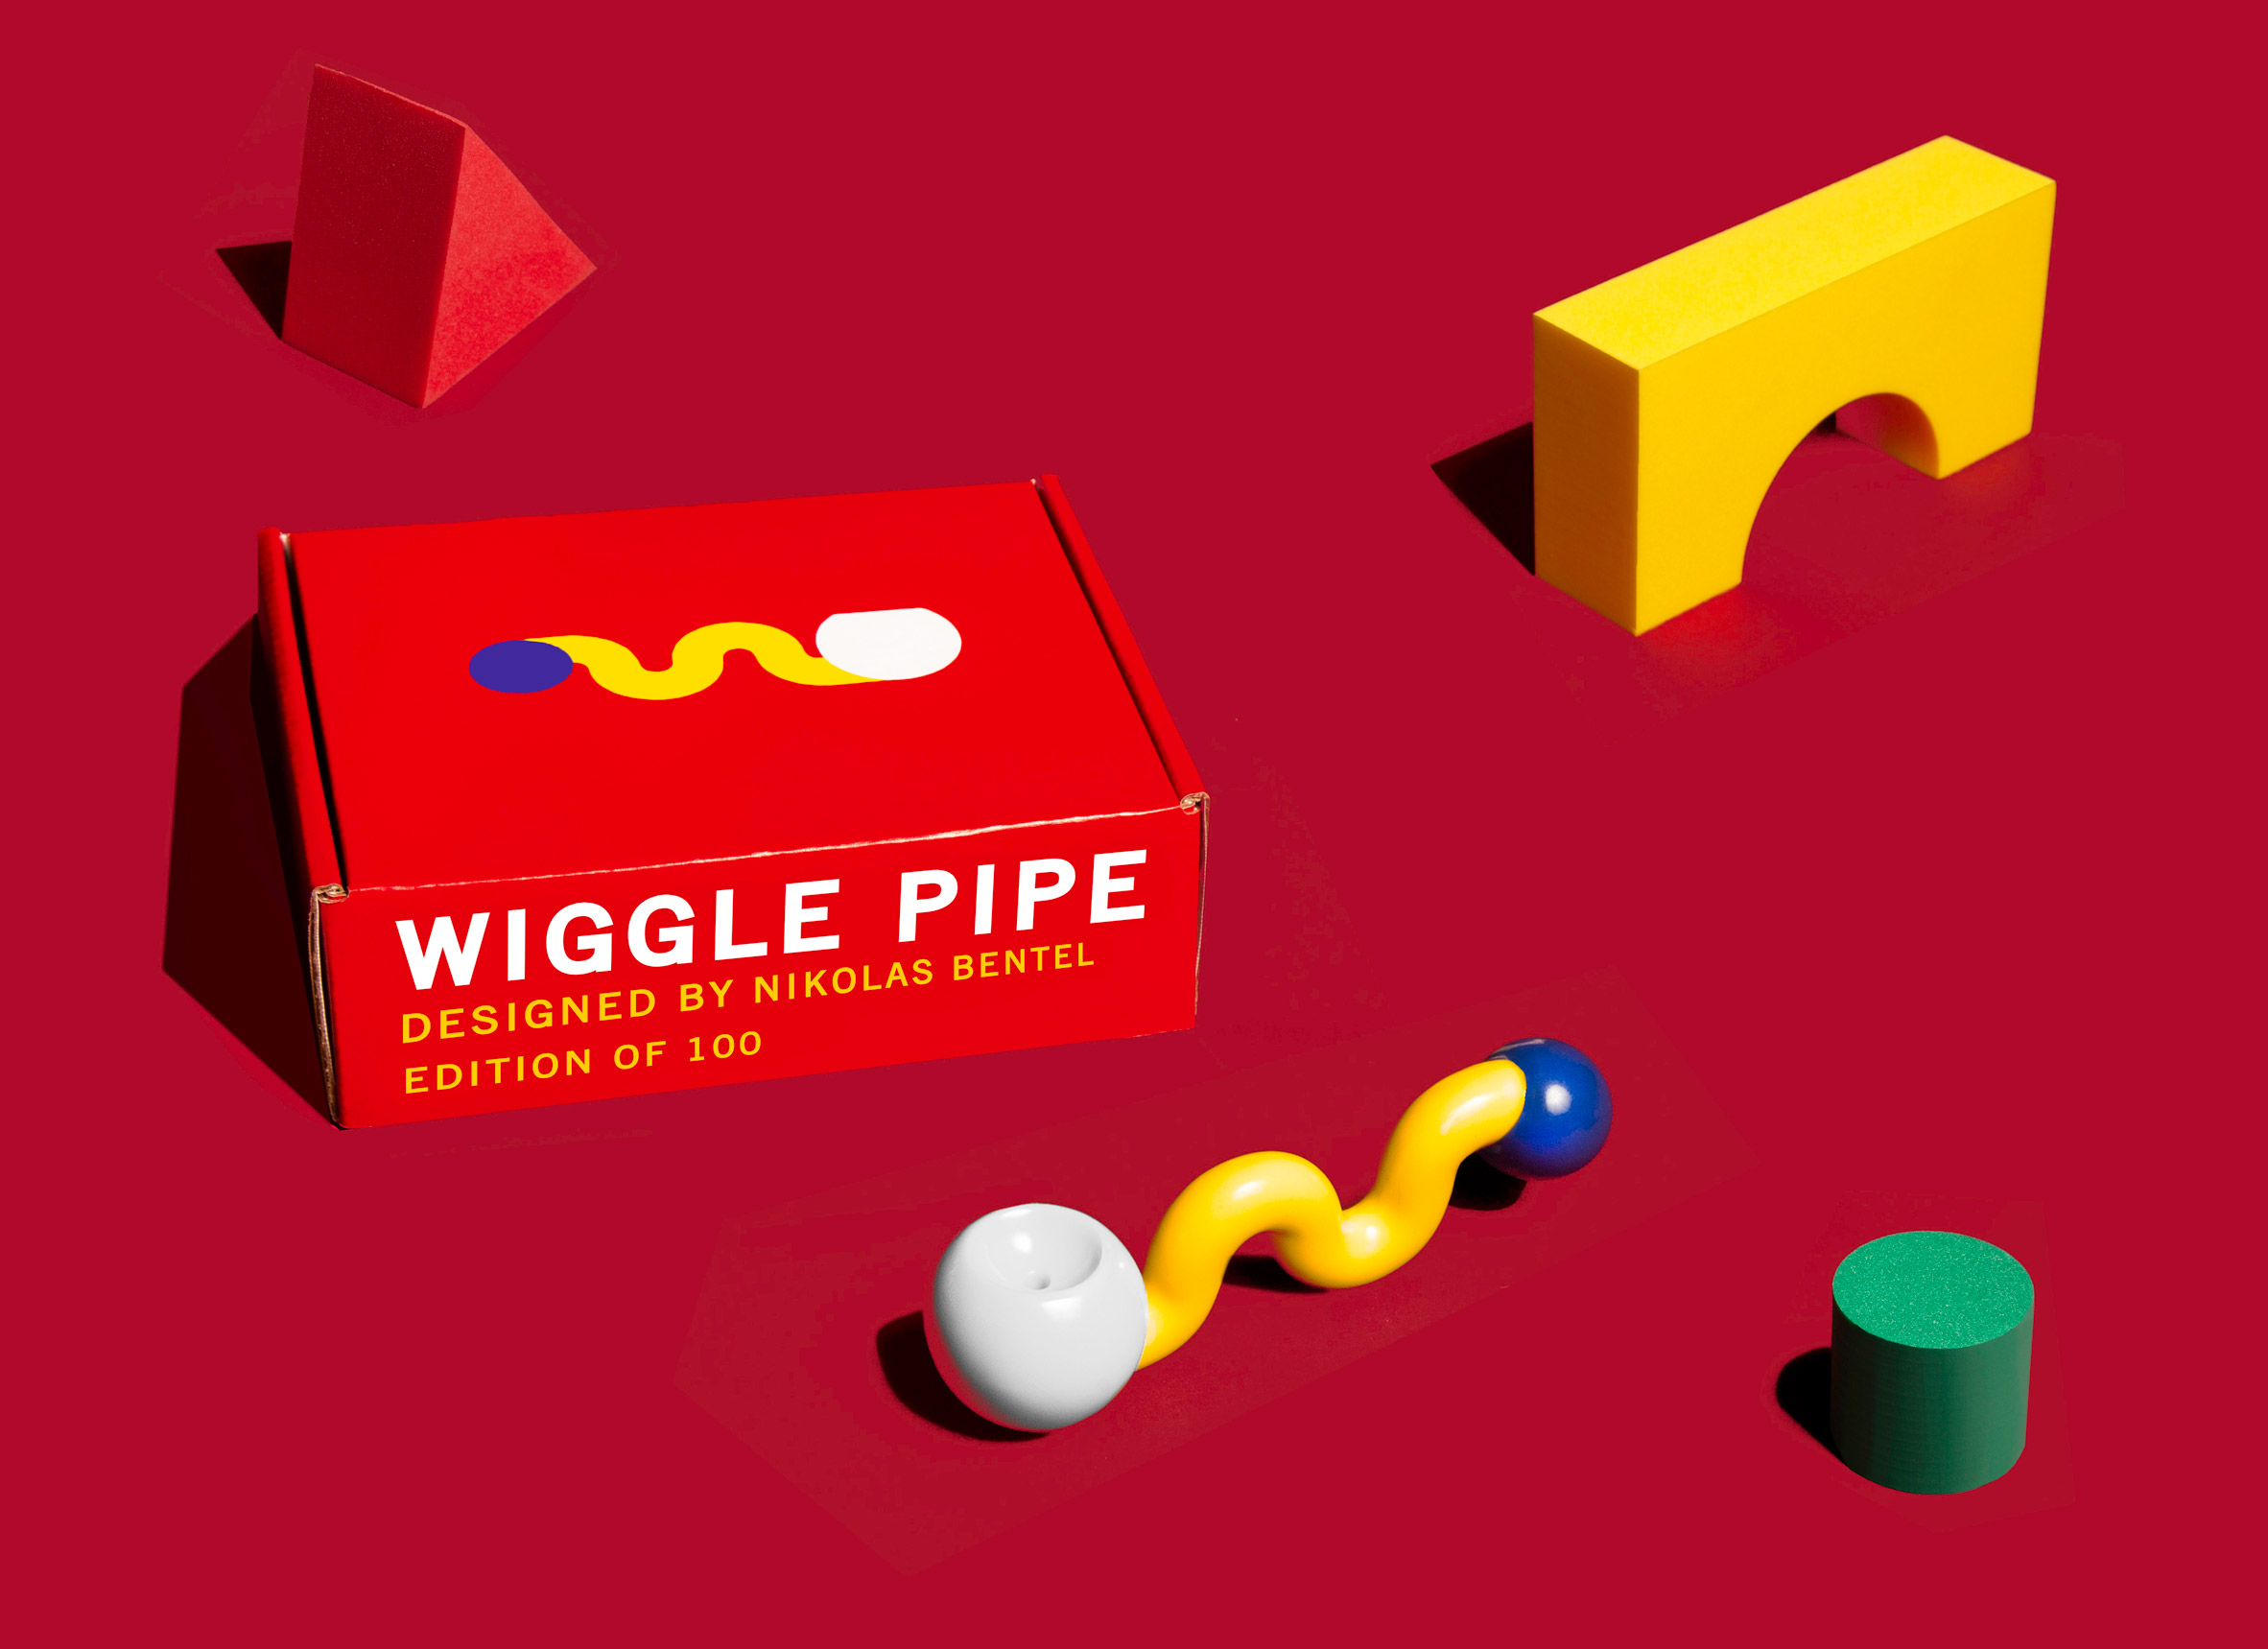 The Wiggle Pipe by Nik Bentel